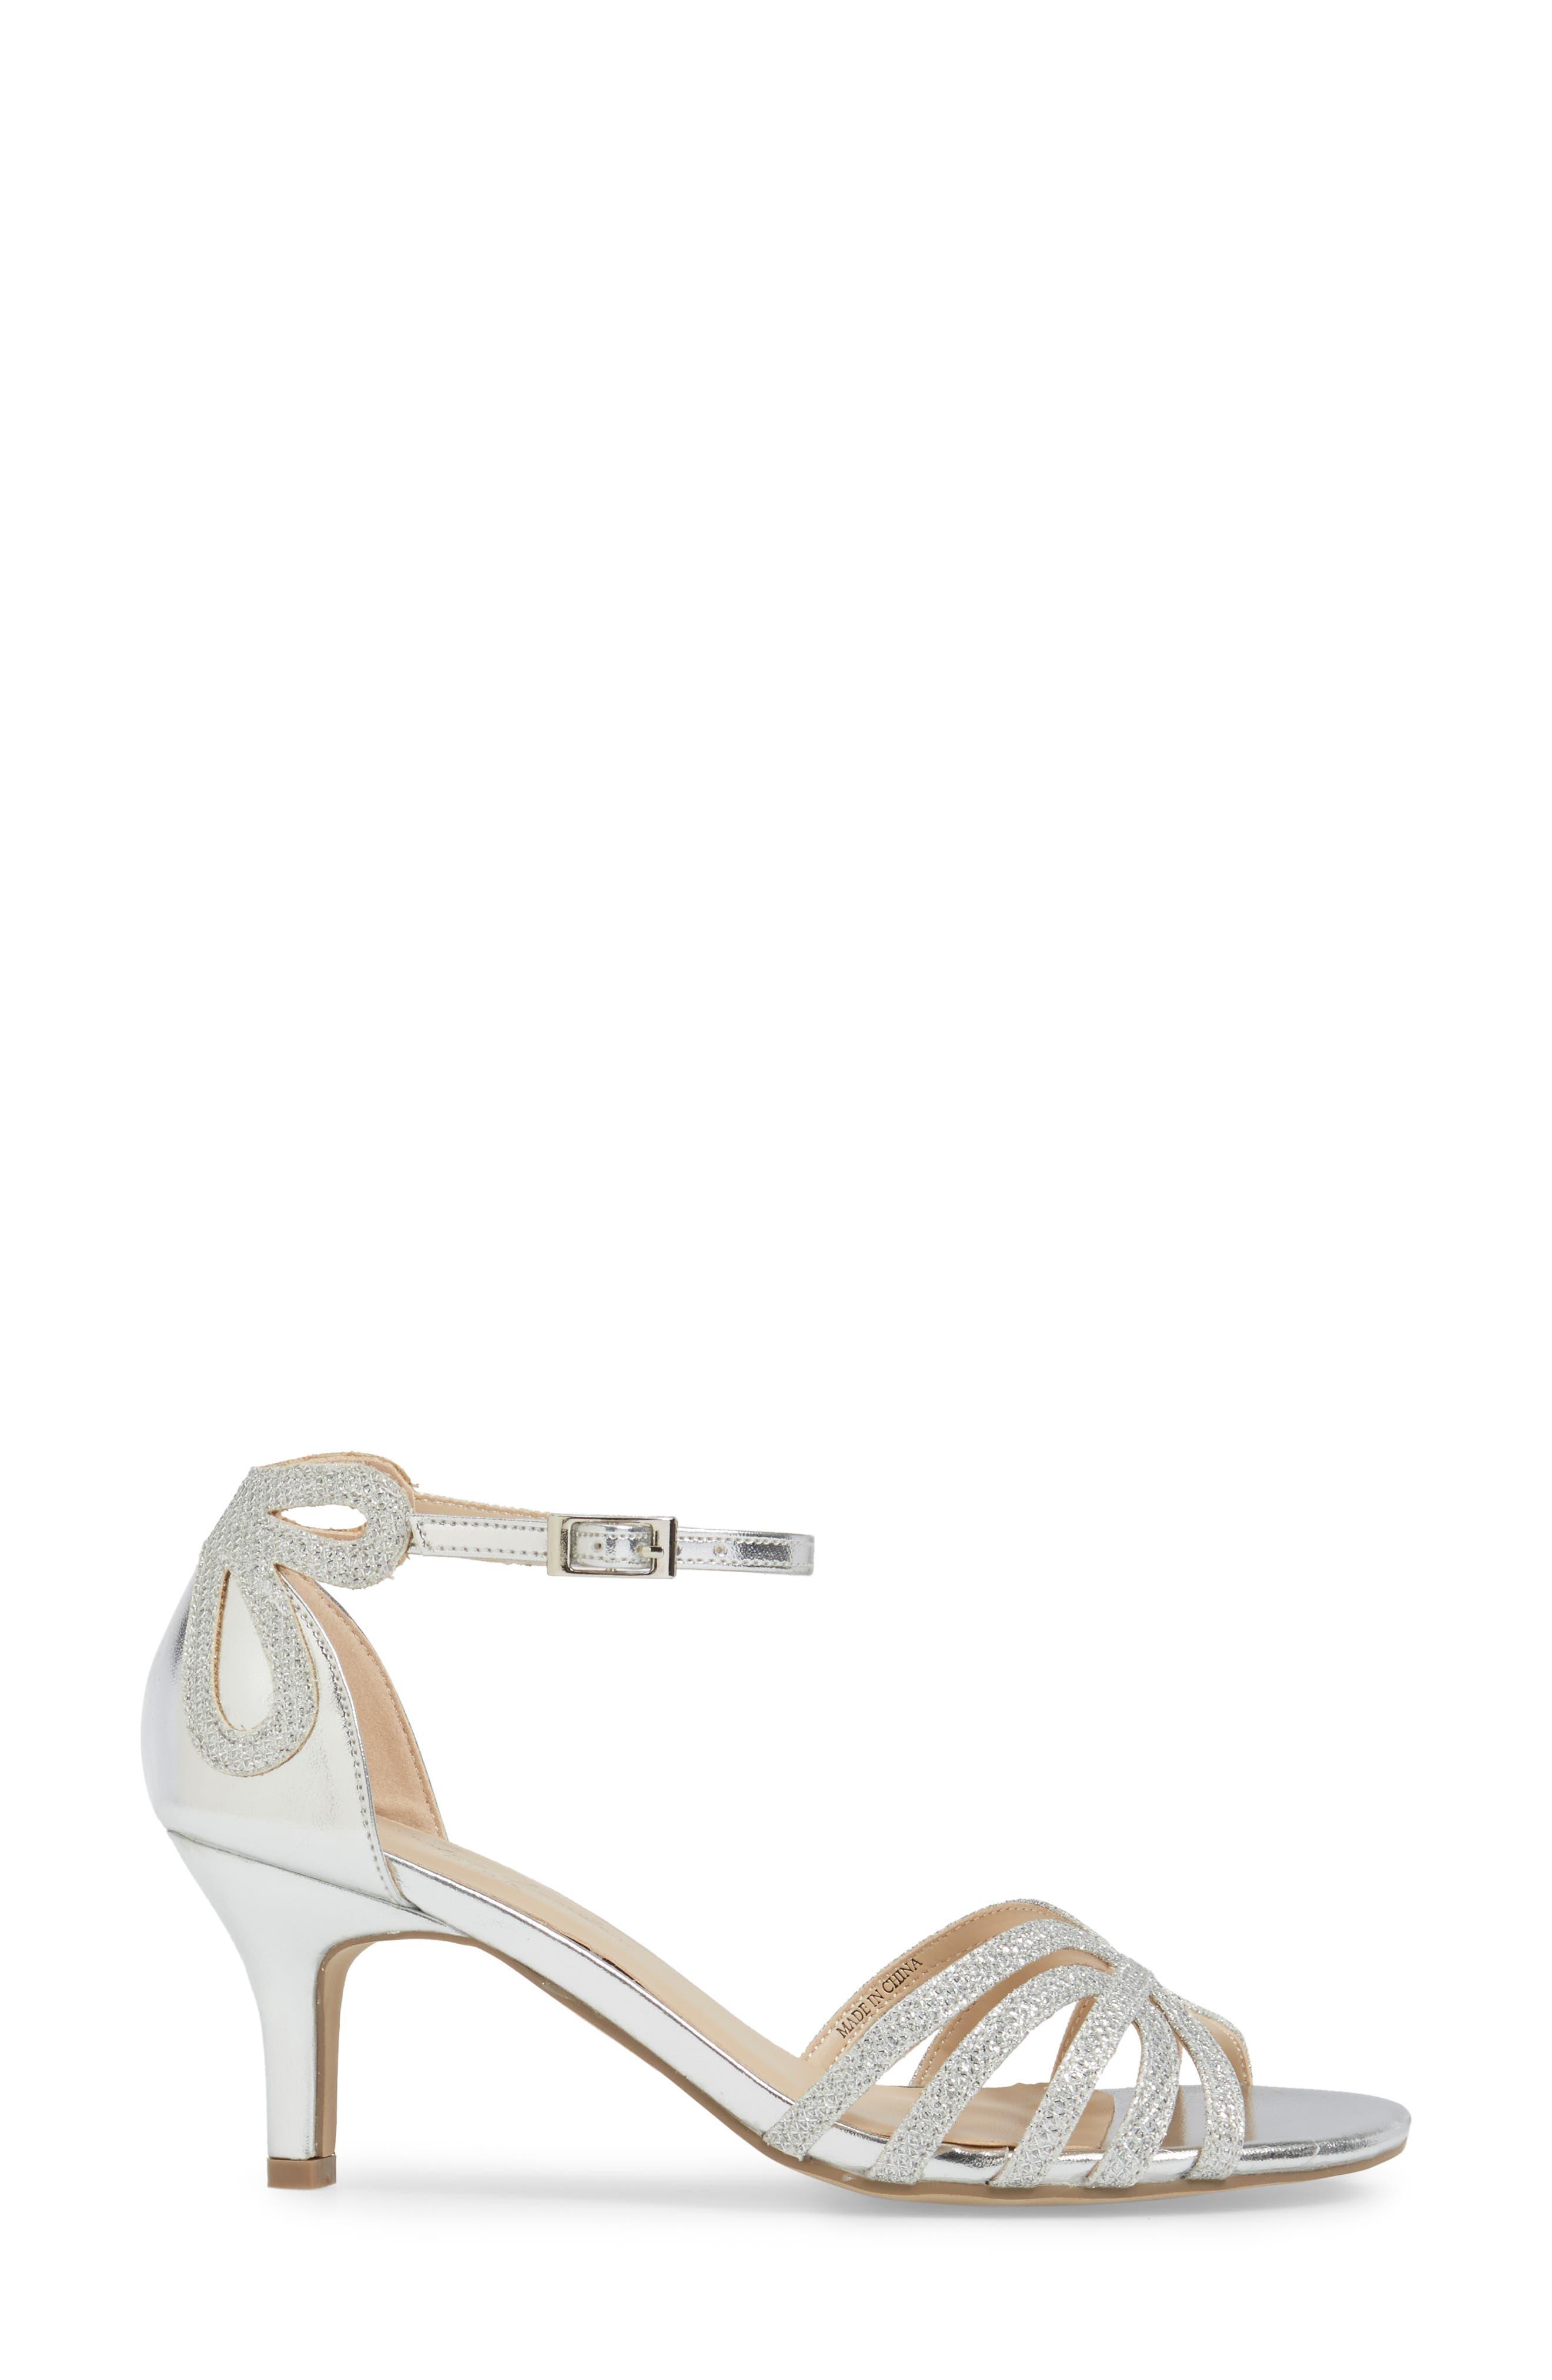 Melby Ankle Strap Sandal,                             Alternate thumbnail 3, color,                             SILVER